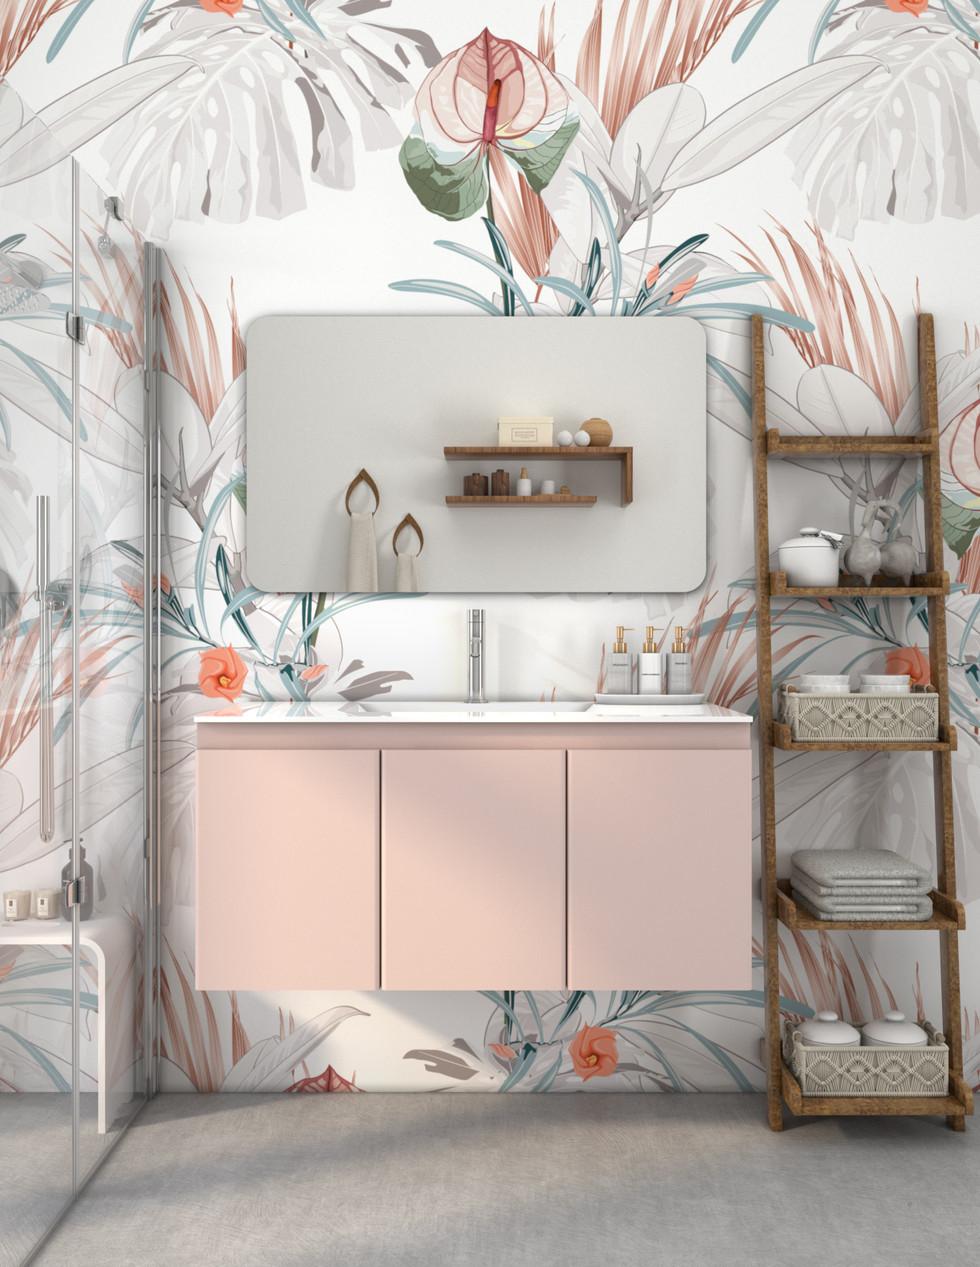 Doors 100 - Pink_app.jpg